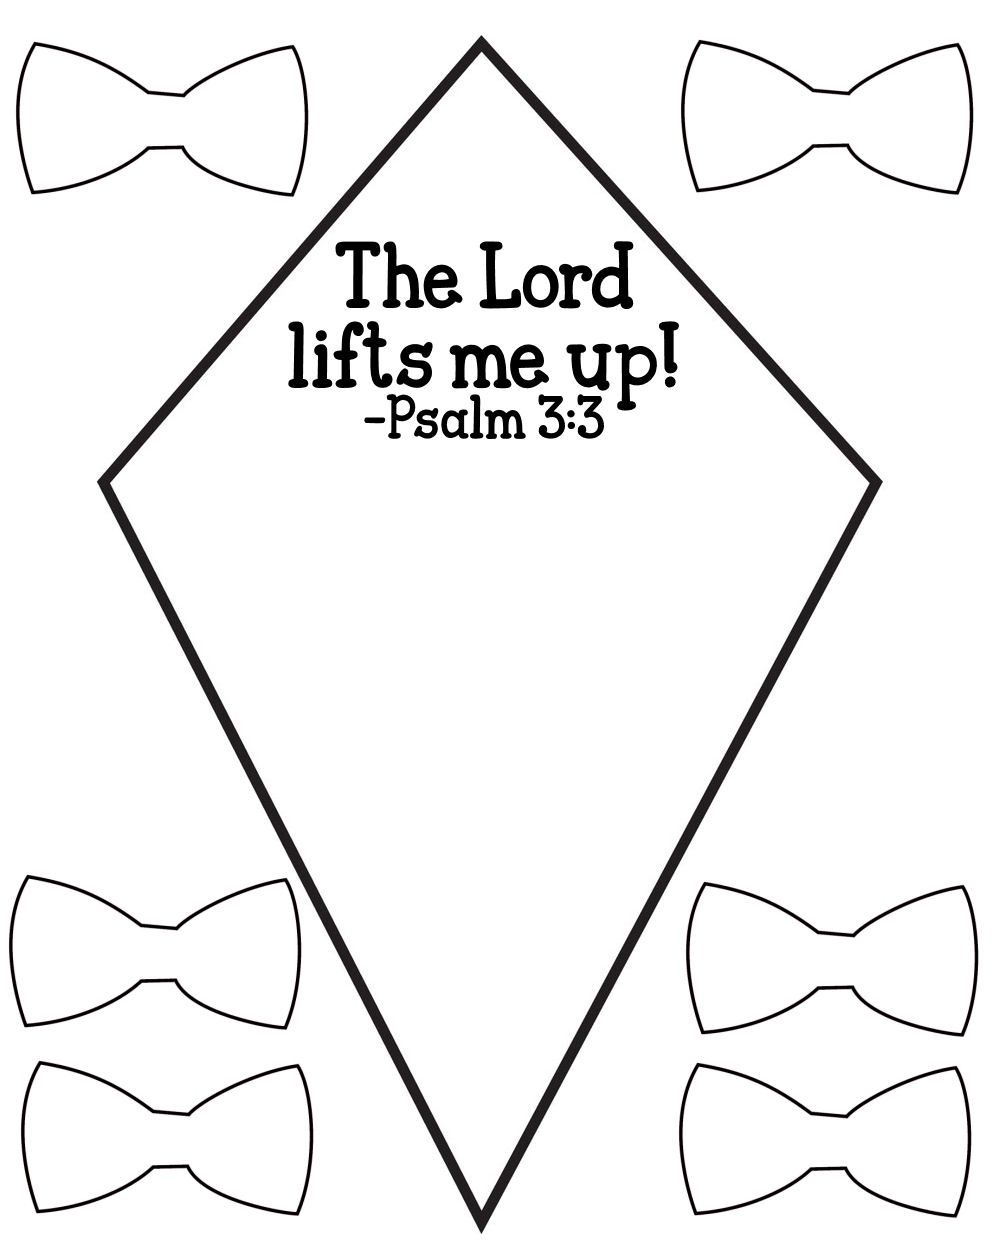 Free Psalm 3:3 Kids Bible Lesson Activity Printables - Free Printable Children's Bible Lessons